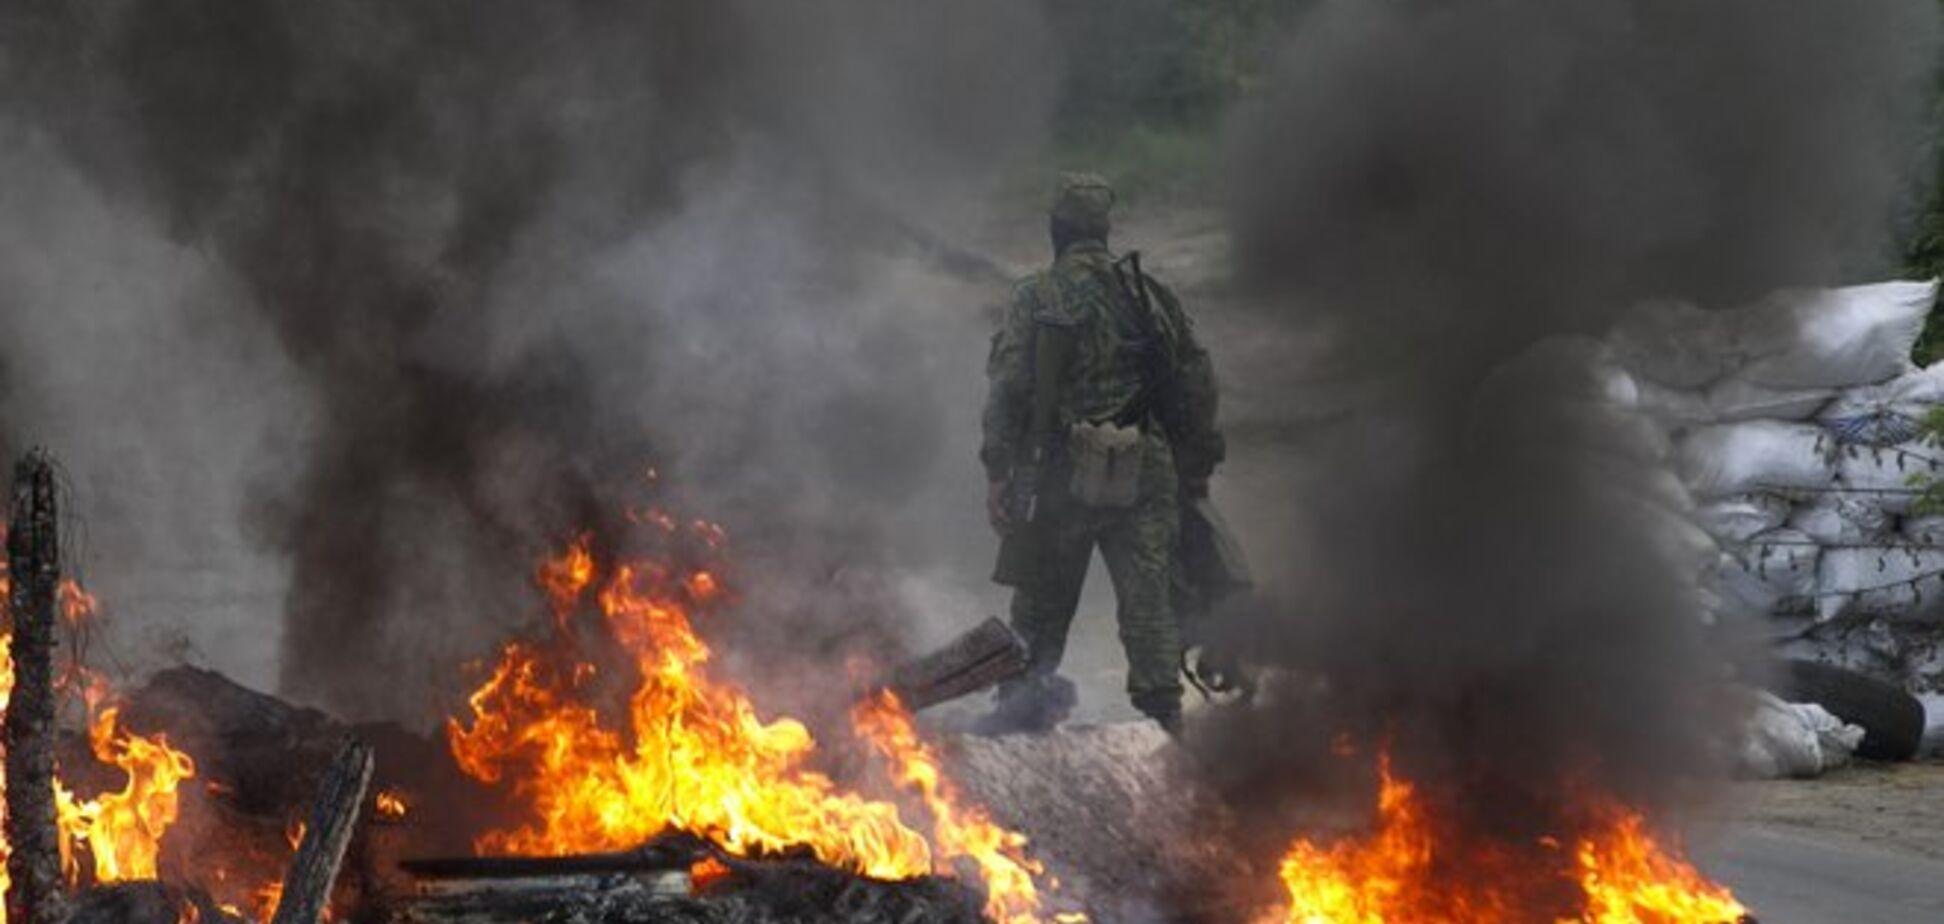 За сутки в зоне АТО погибли 10 бойцов - Генштаб